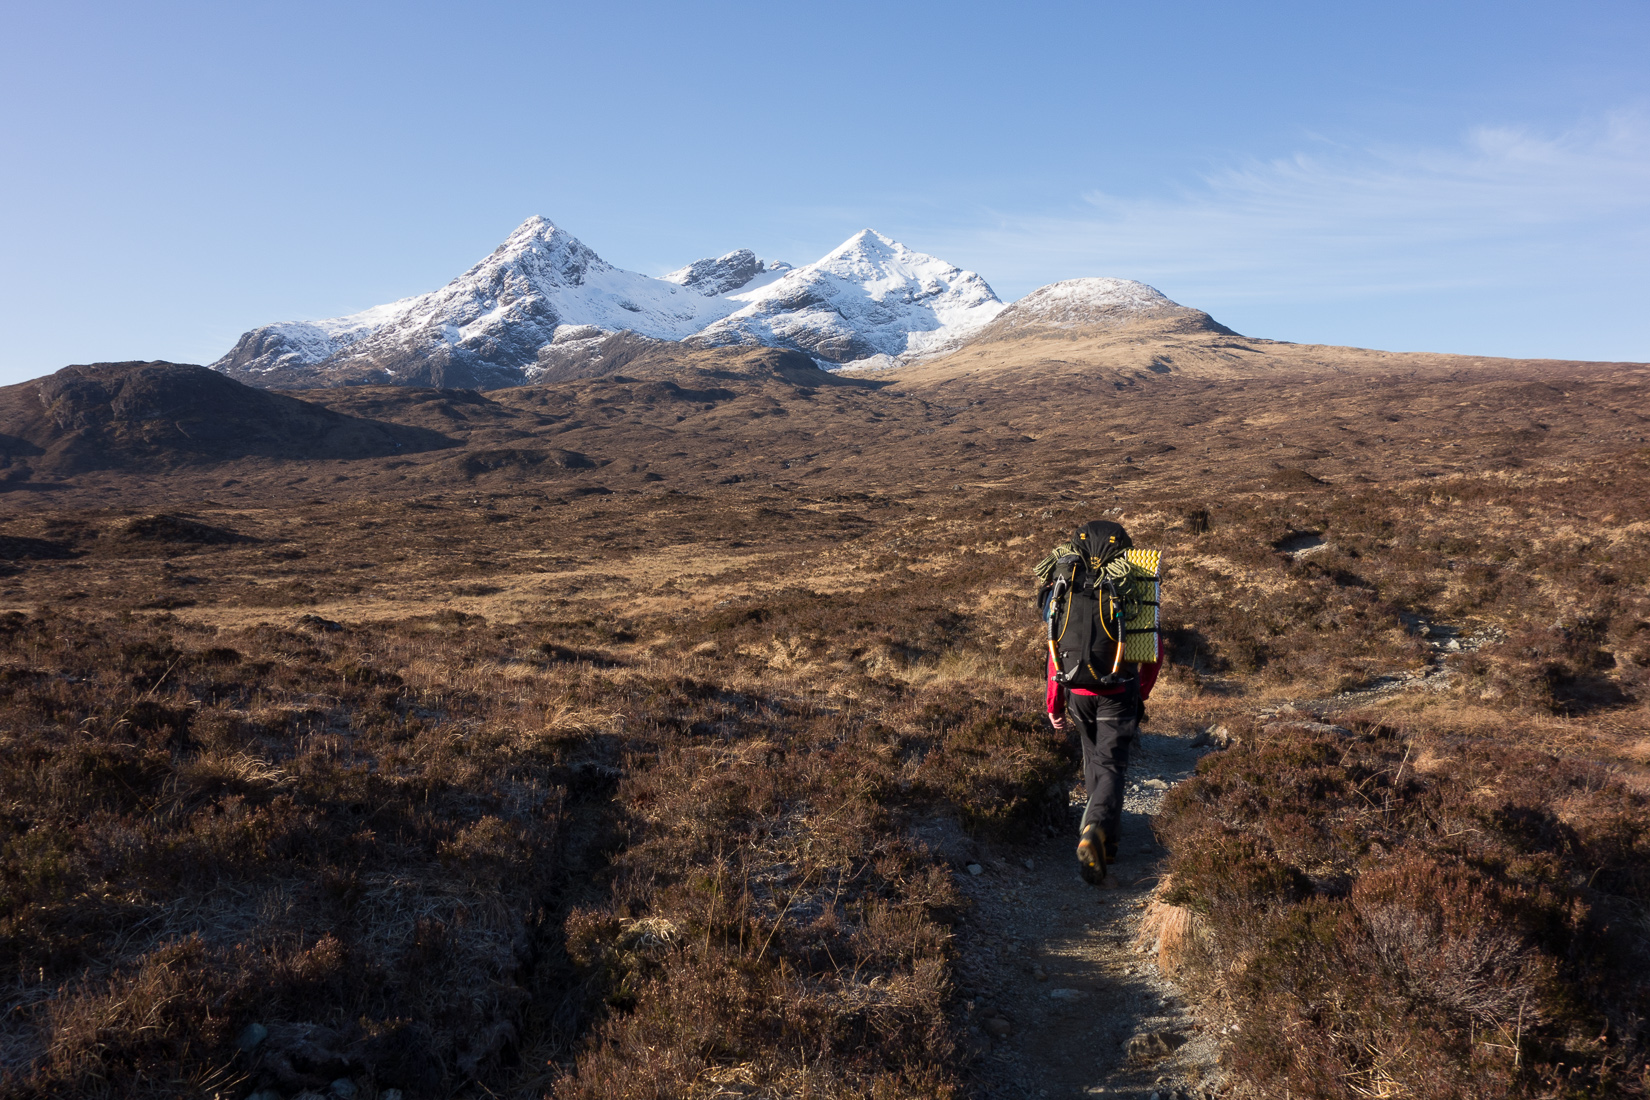 Walking into Sgurr nan Gillean